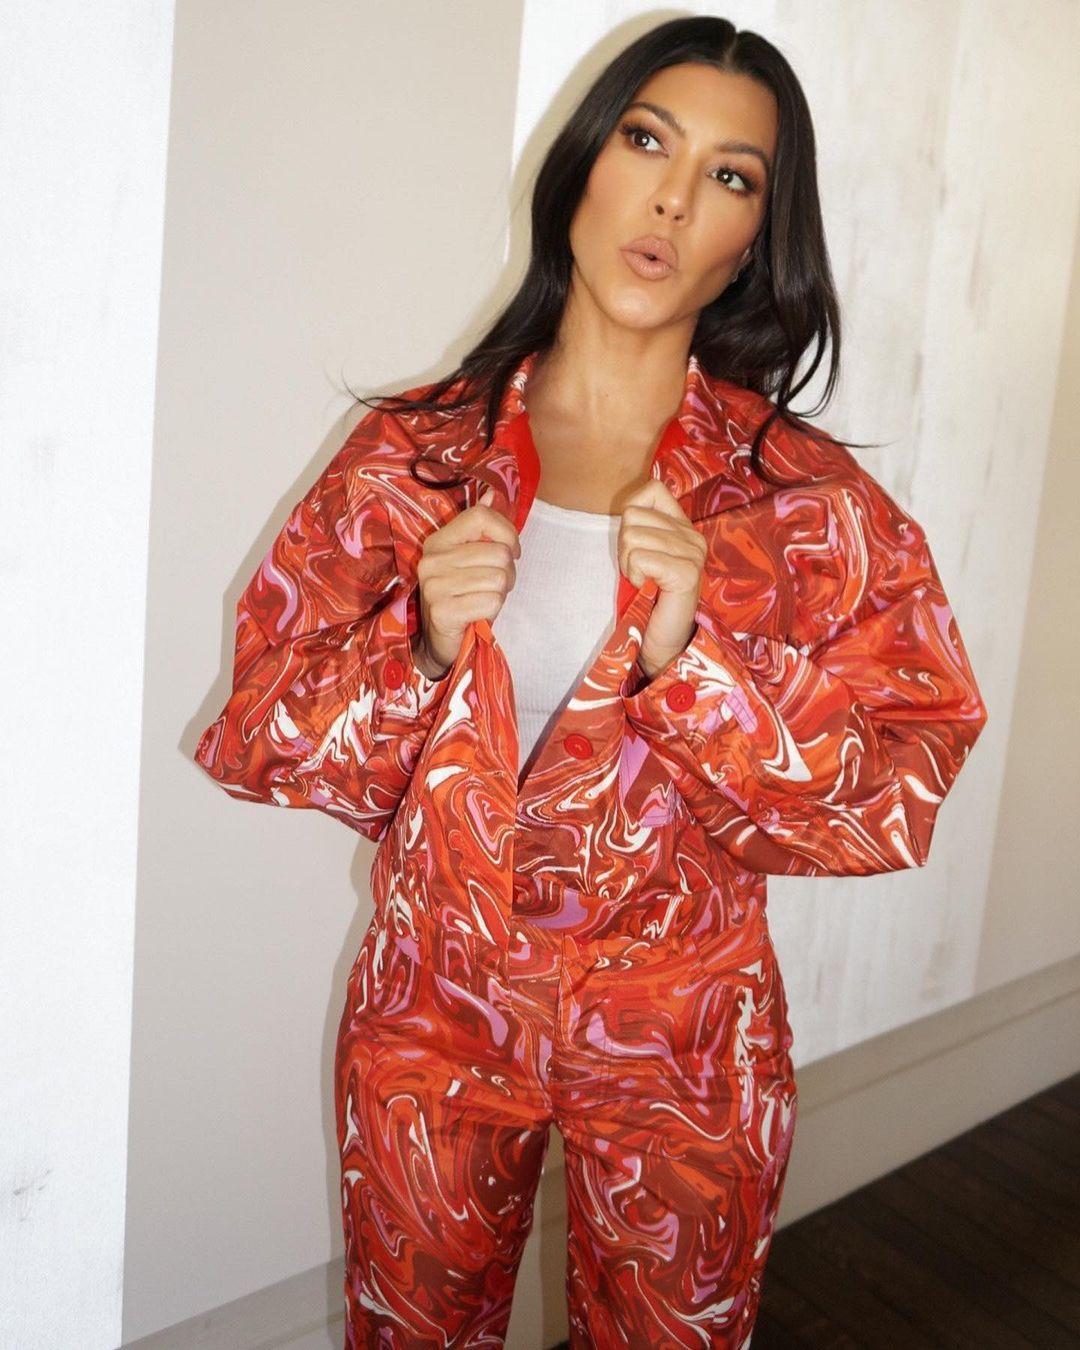 Kourtney Kardashian, white boots, orange crop jacket, high heel, narrow, pointy, white tank top, orange trousers. Kourtney Kardashian rocking pointy white boots with high heel